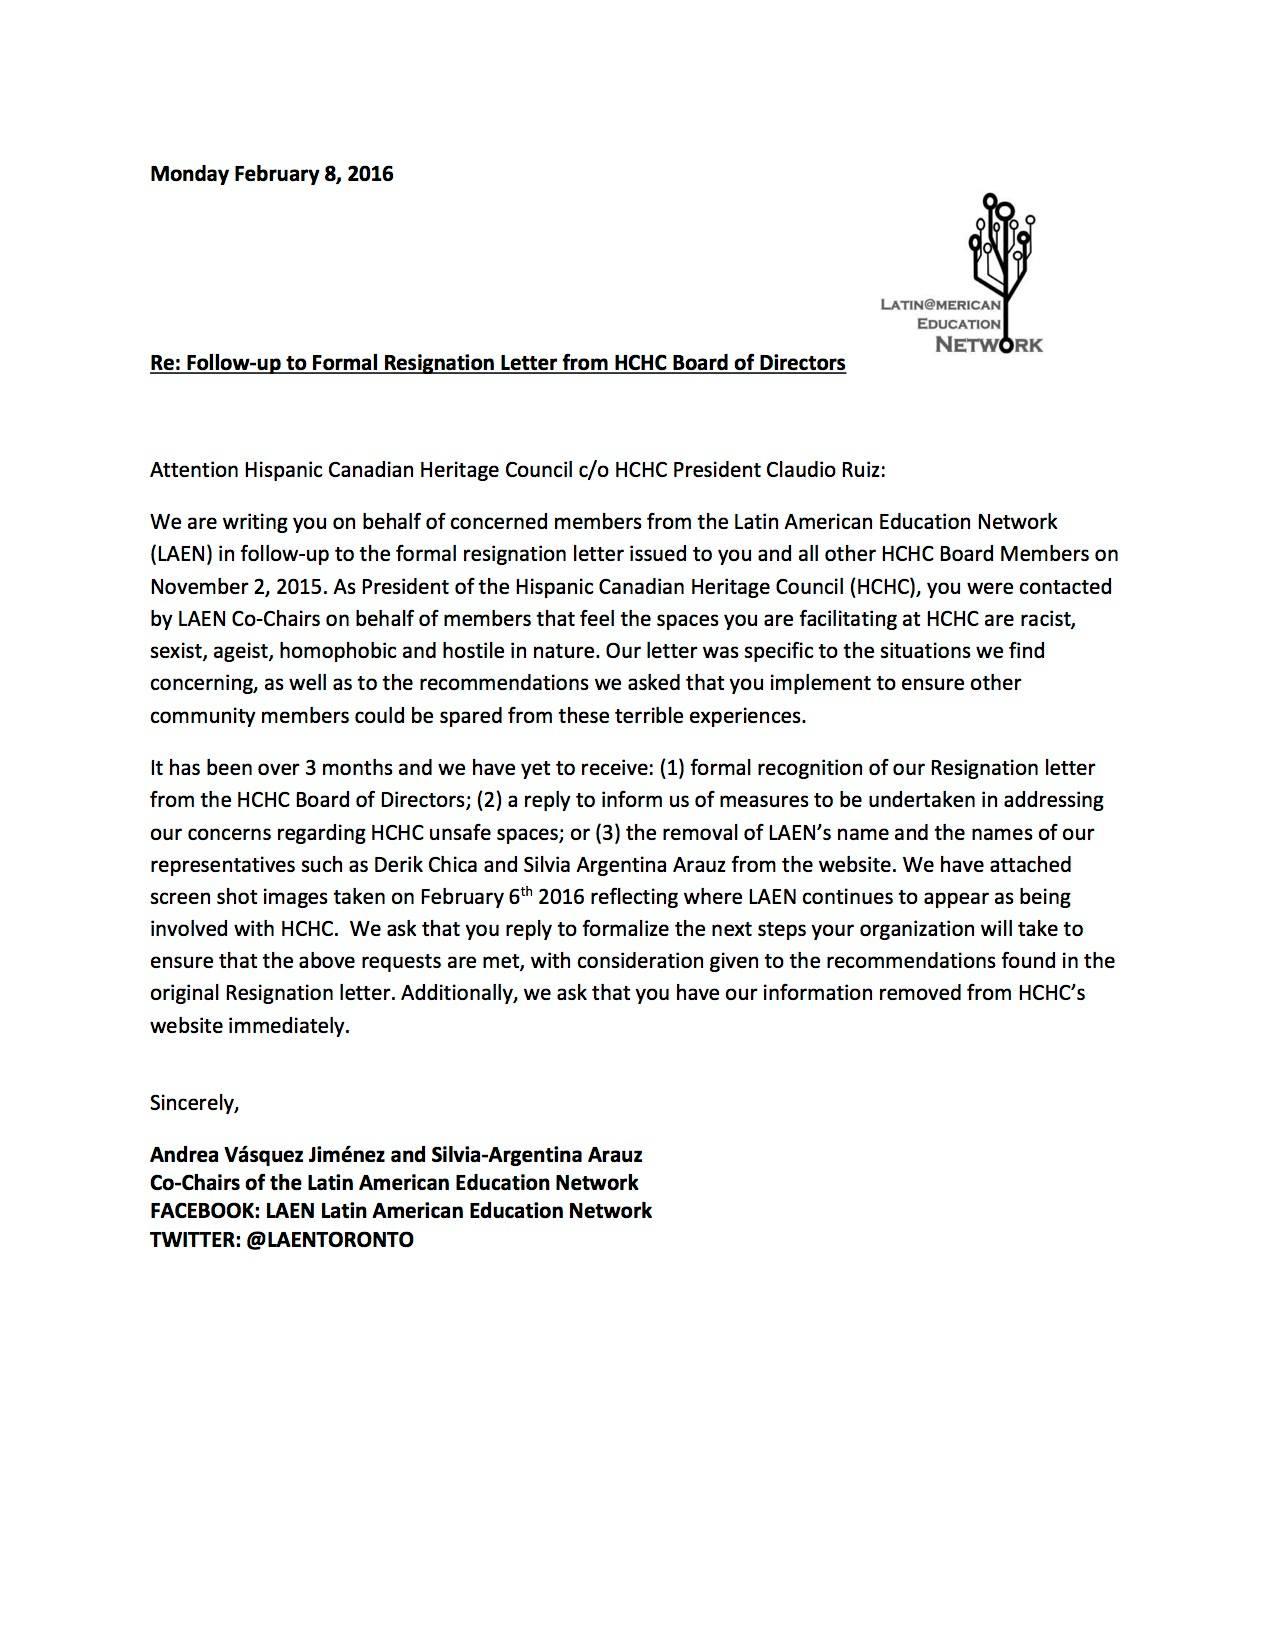 Ceo Resignation Letter customer service supervisor cover letter – Board Resignation Letter